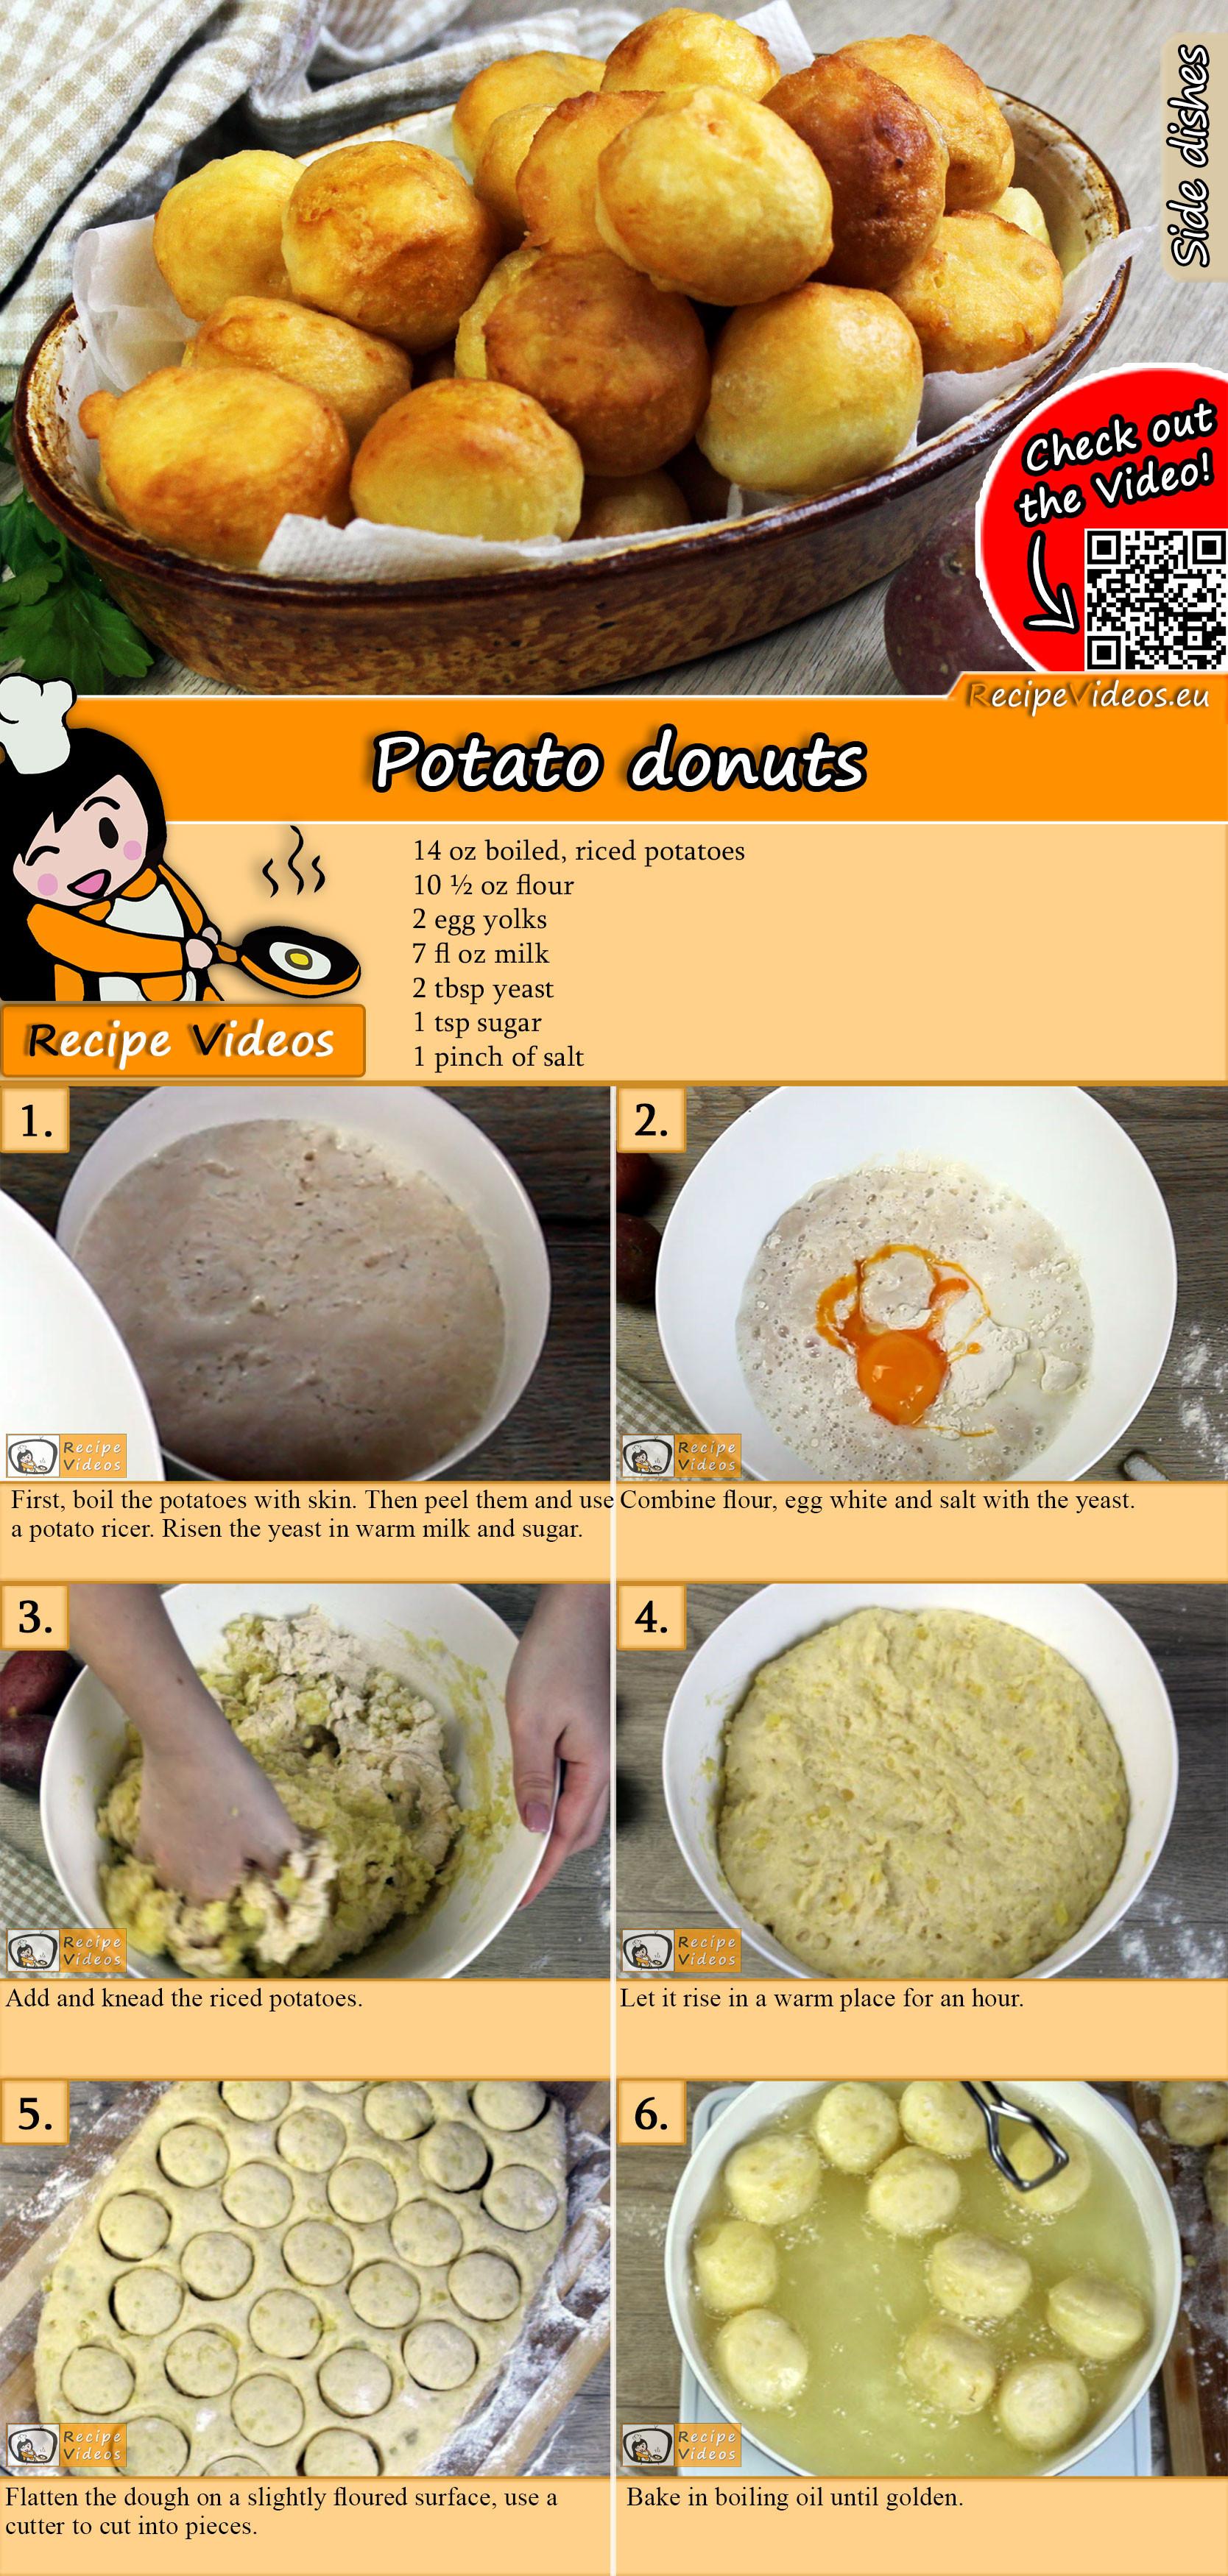 Potato donuts recipe with video